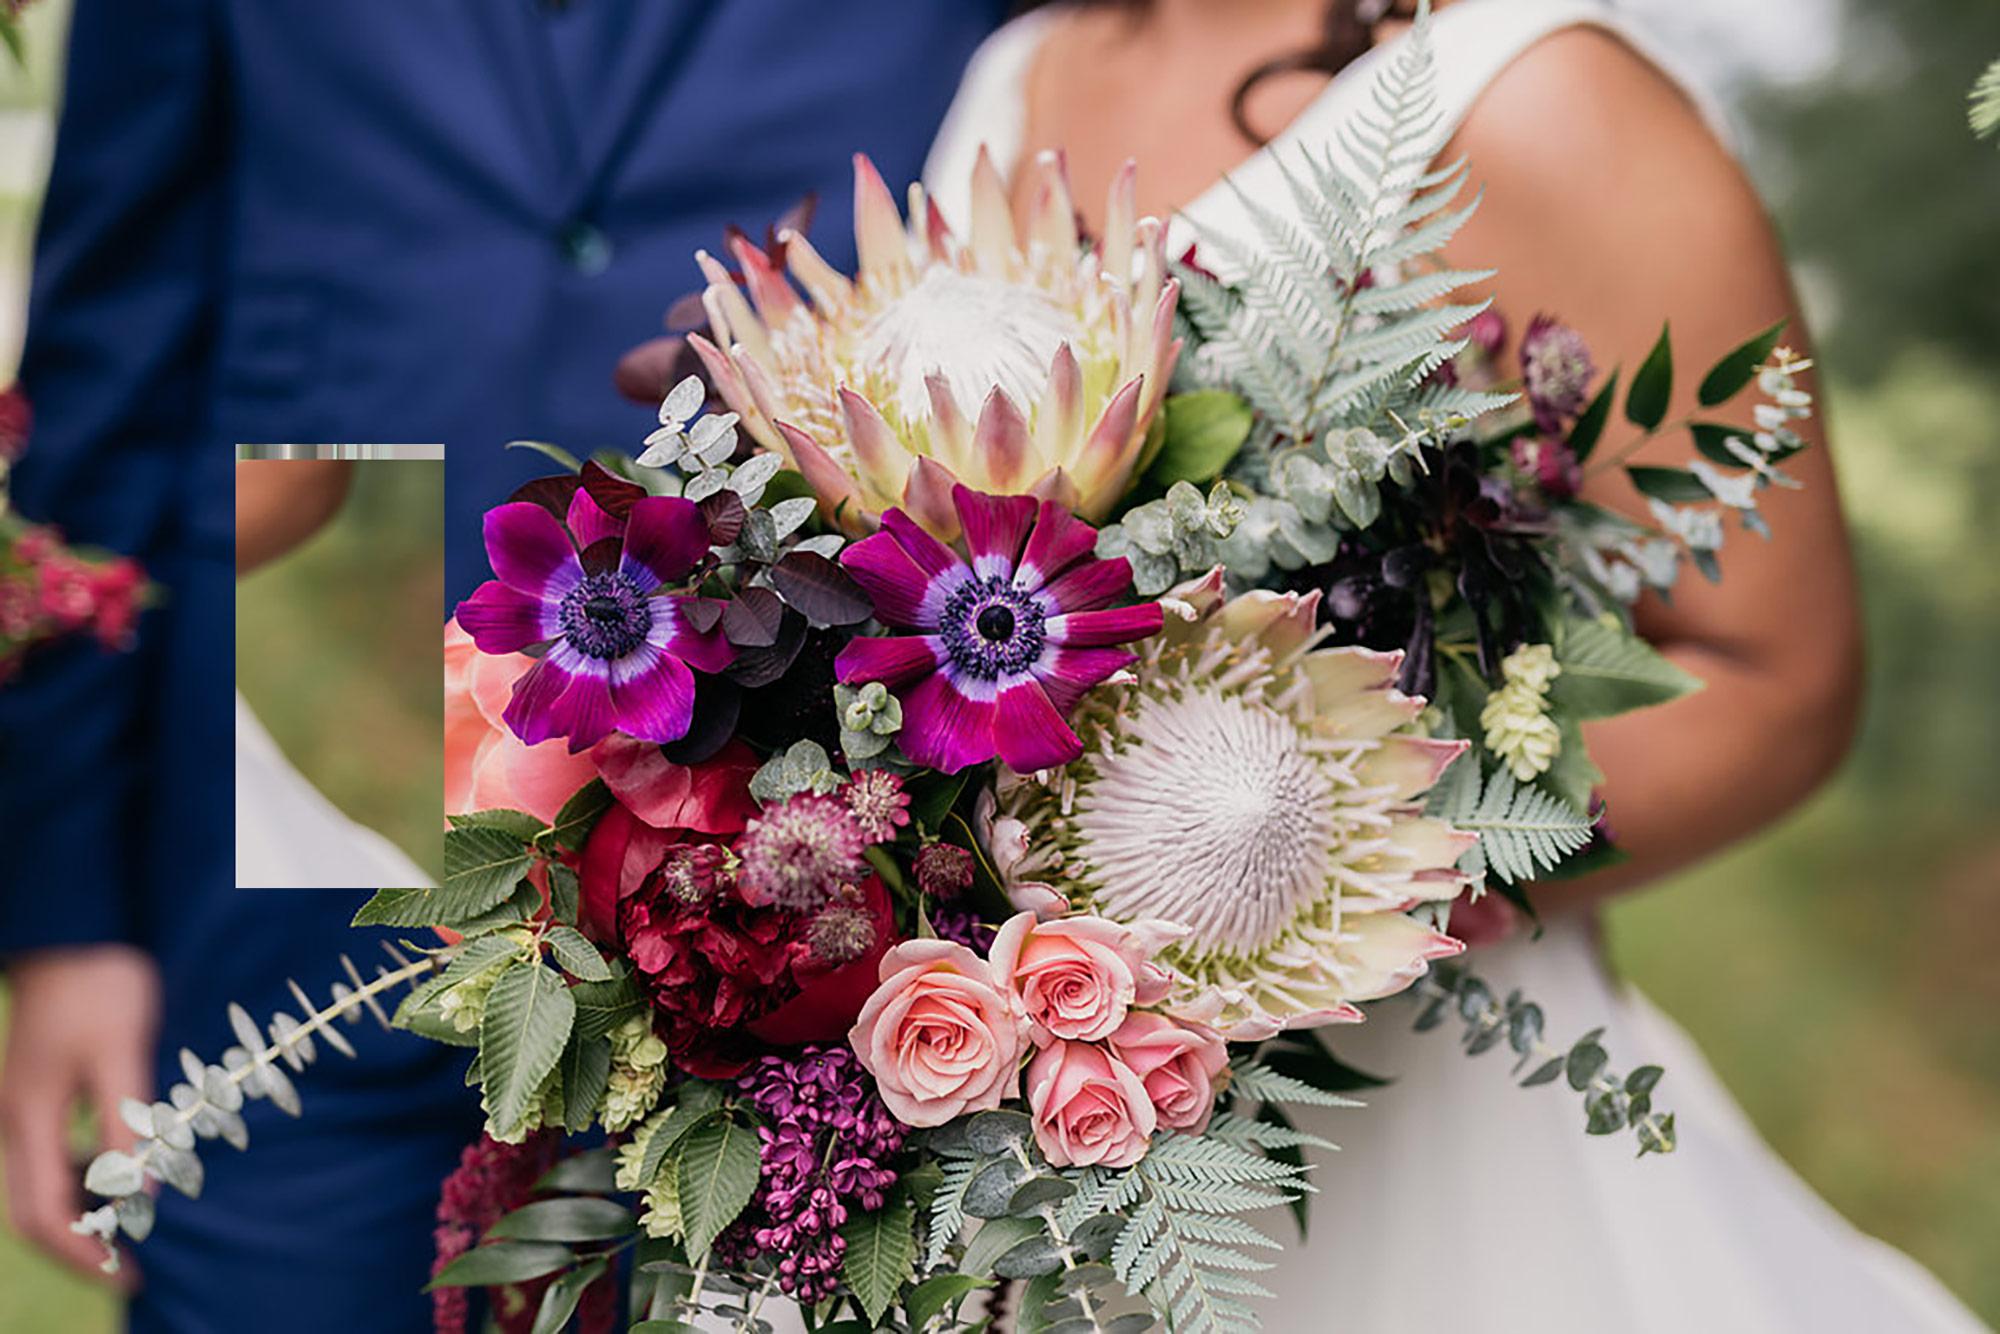 Kurtz-Orchards-Wedding-Niagara-wedding-Vineyard-Bride-Photography-by-Kayla-Rocca-009.JPG